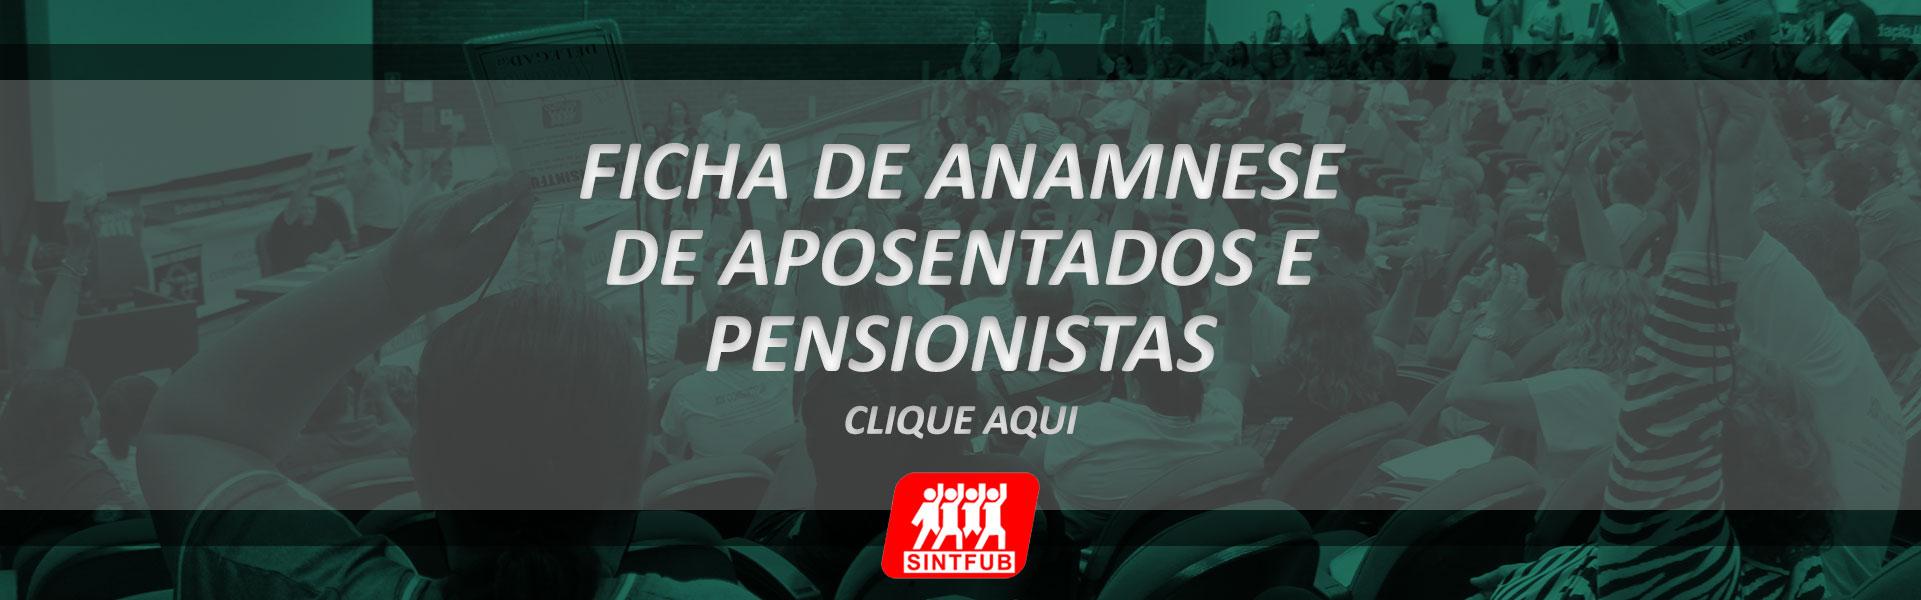 Ficha_Anamnese_02_SINTFUB